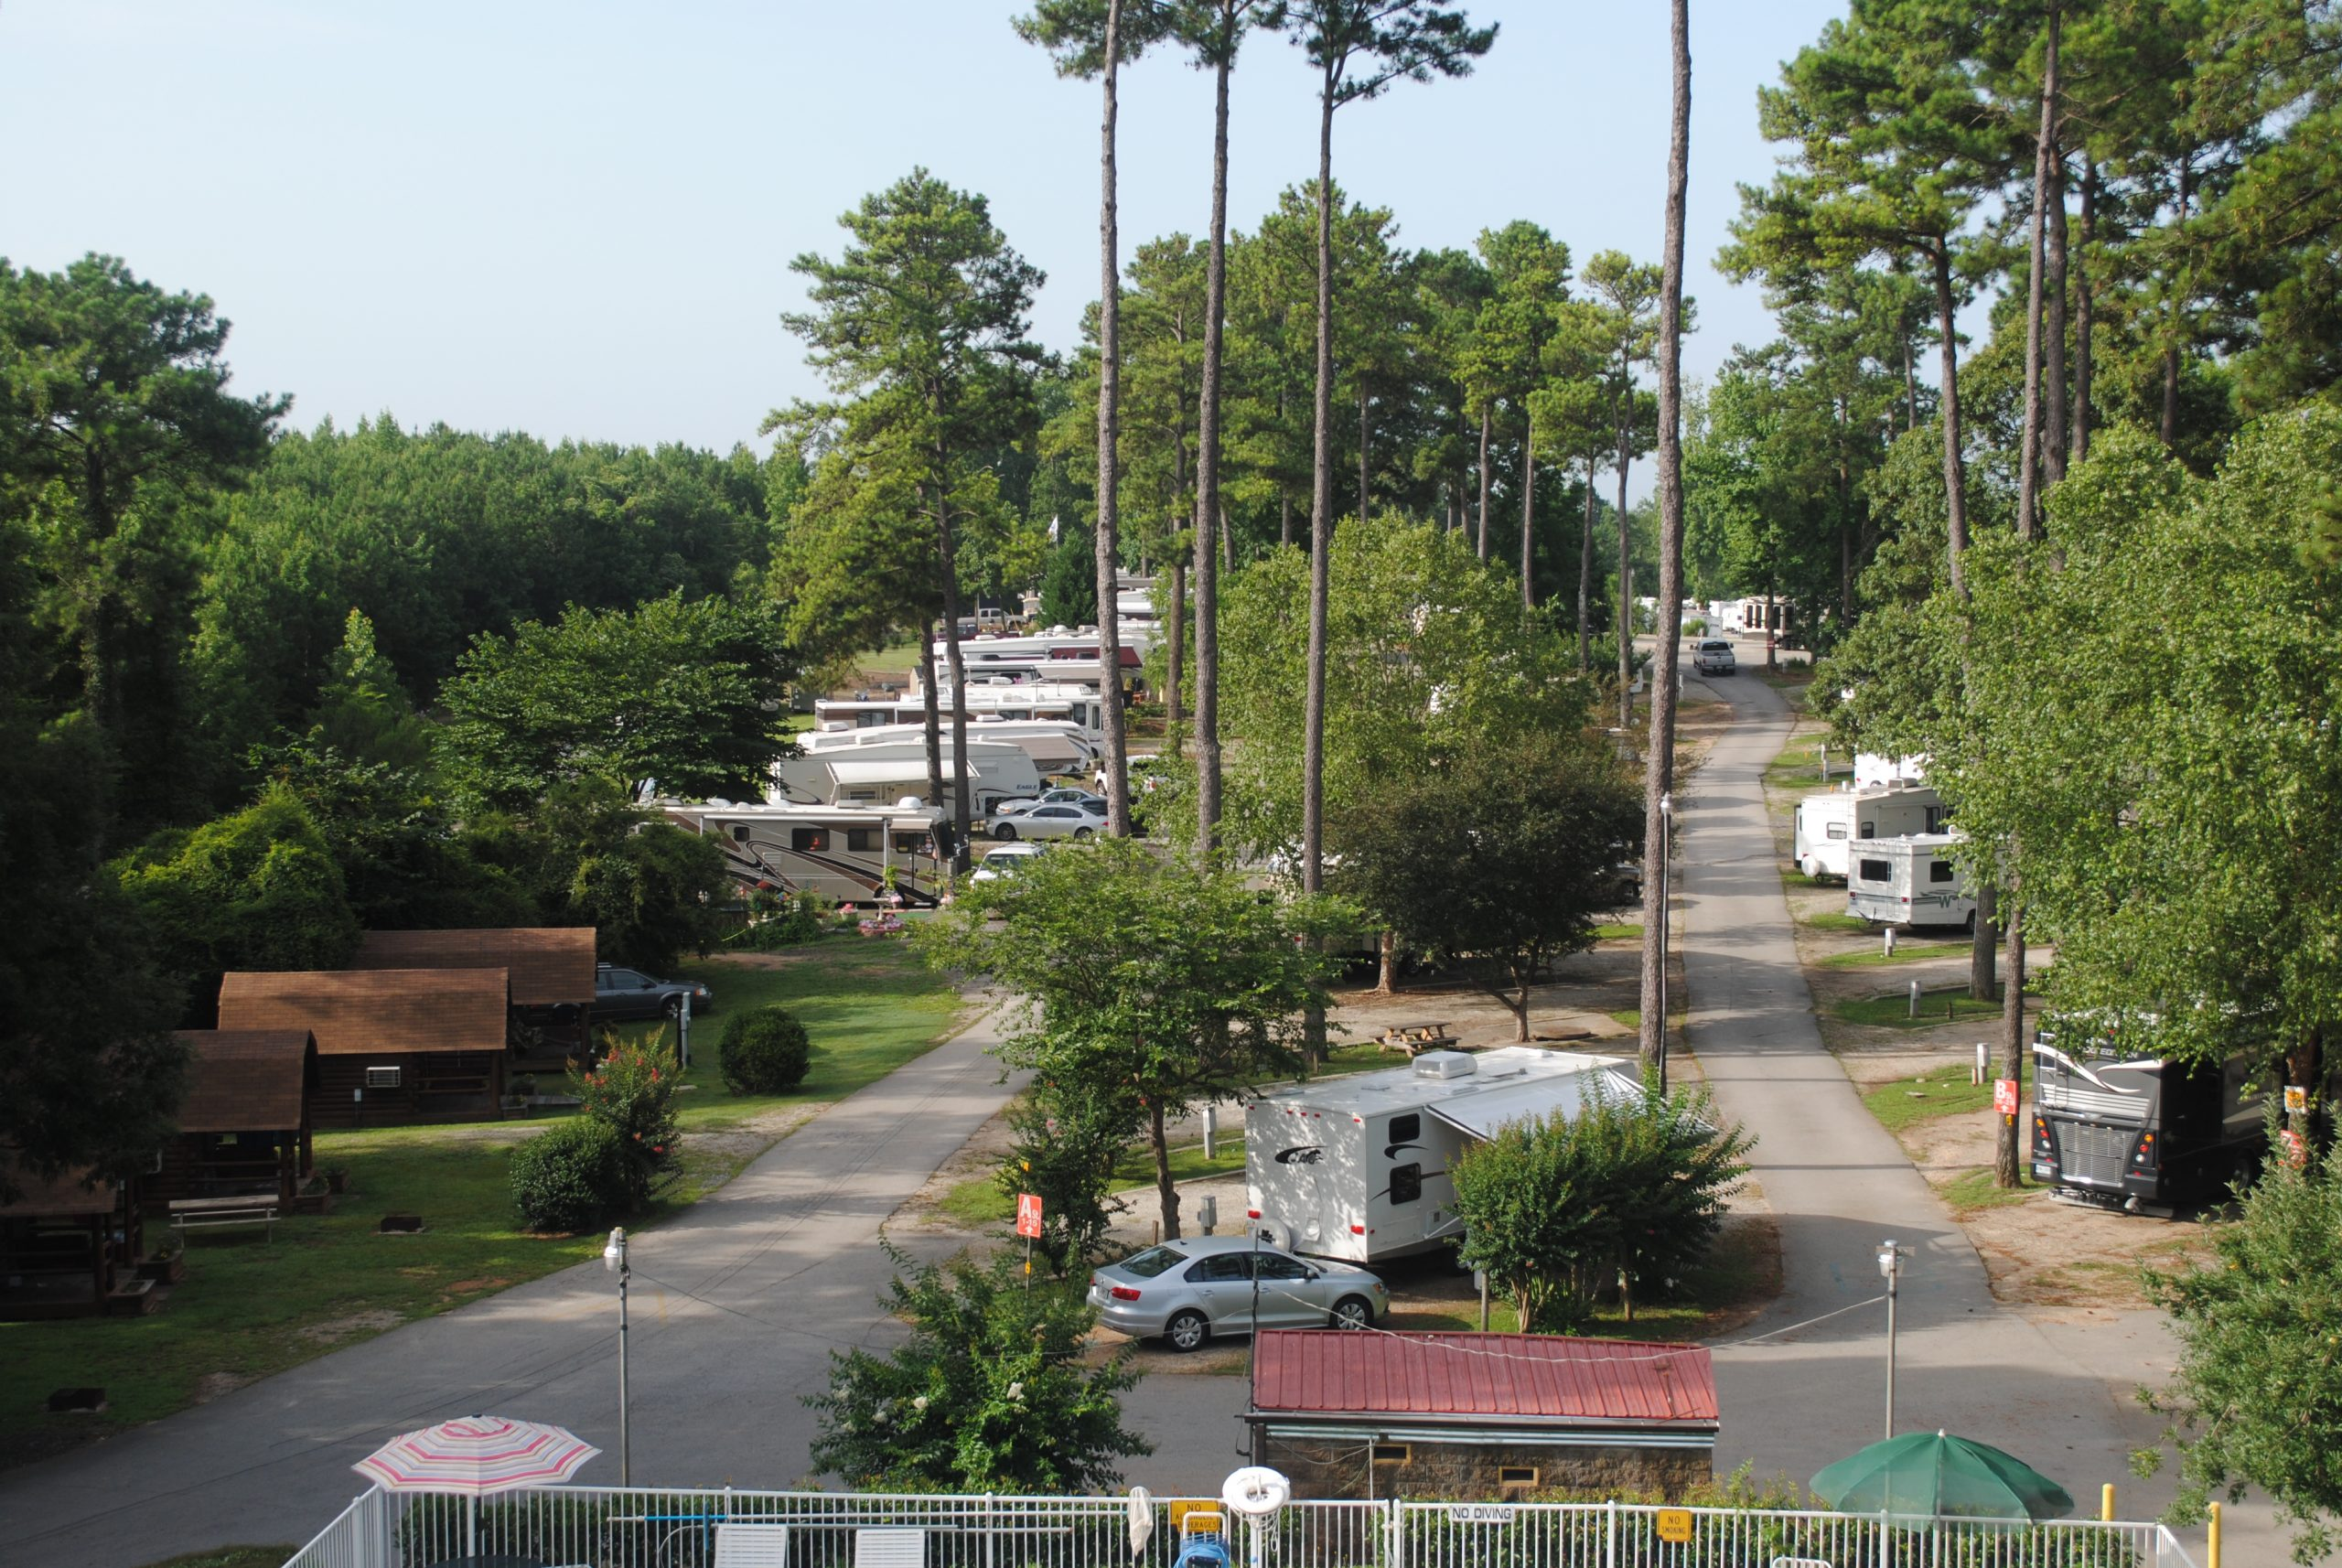 Atlanta South RV Resort - site layout